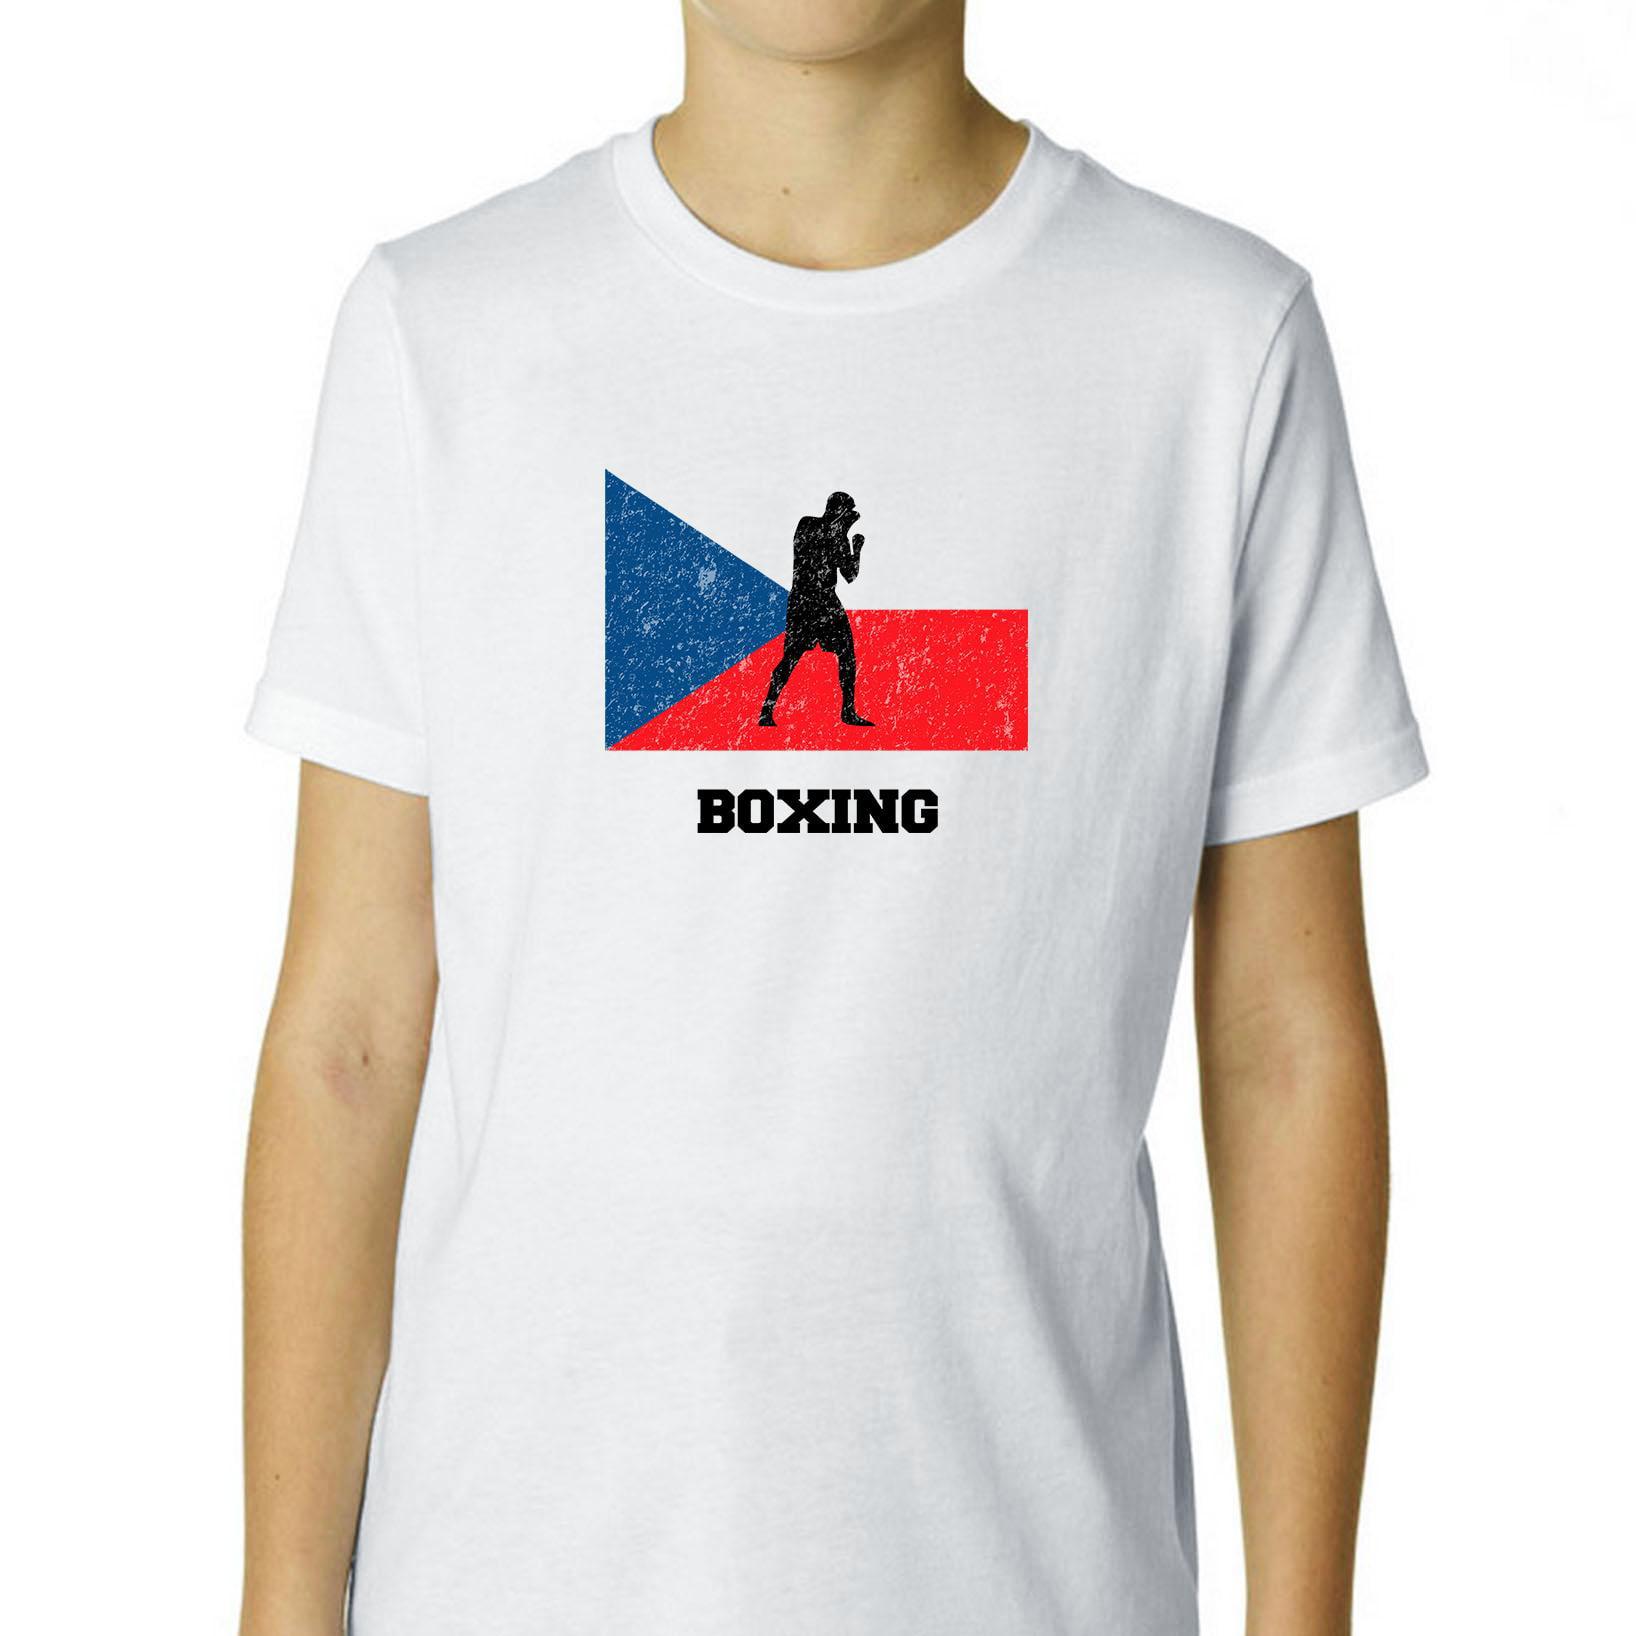 Czech Republic Olympic - Boxing - Flag - Silhouette Boy's Cotton Youth T-Shirt